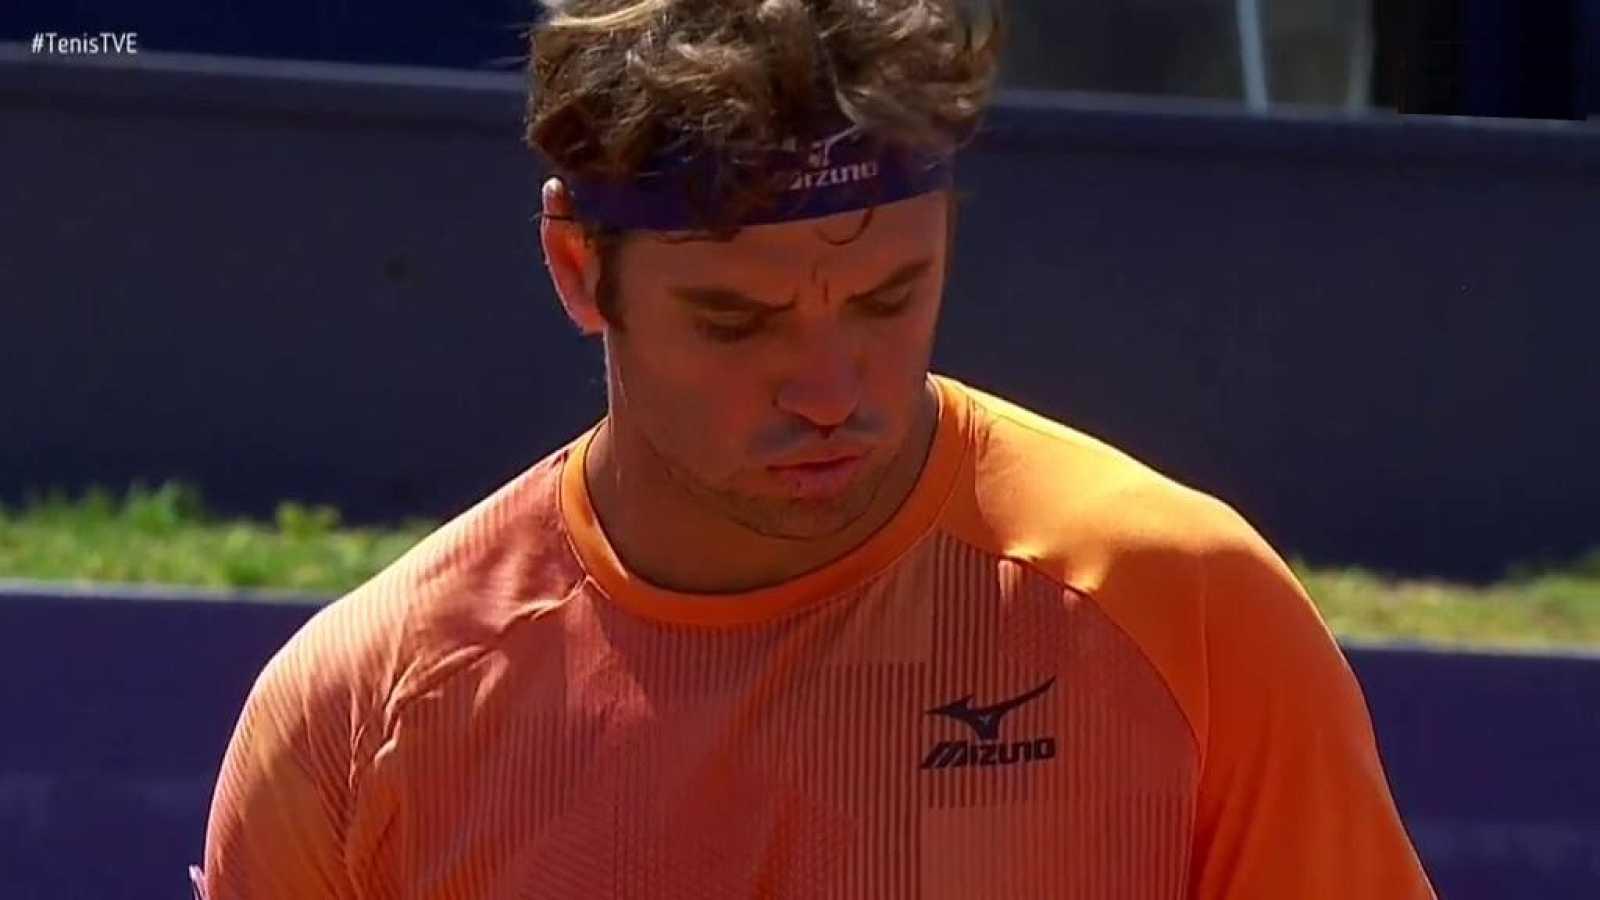 904a8561550 Para todos los públicos Tenis - ATP 500  Trofeo Conde de Godó   Félix Auger- Aliassime - reproducir video